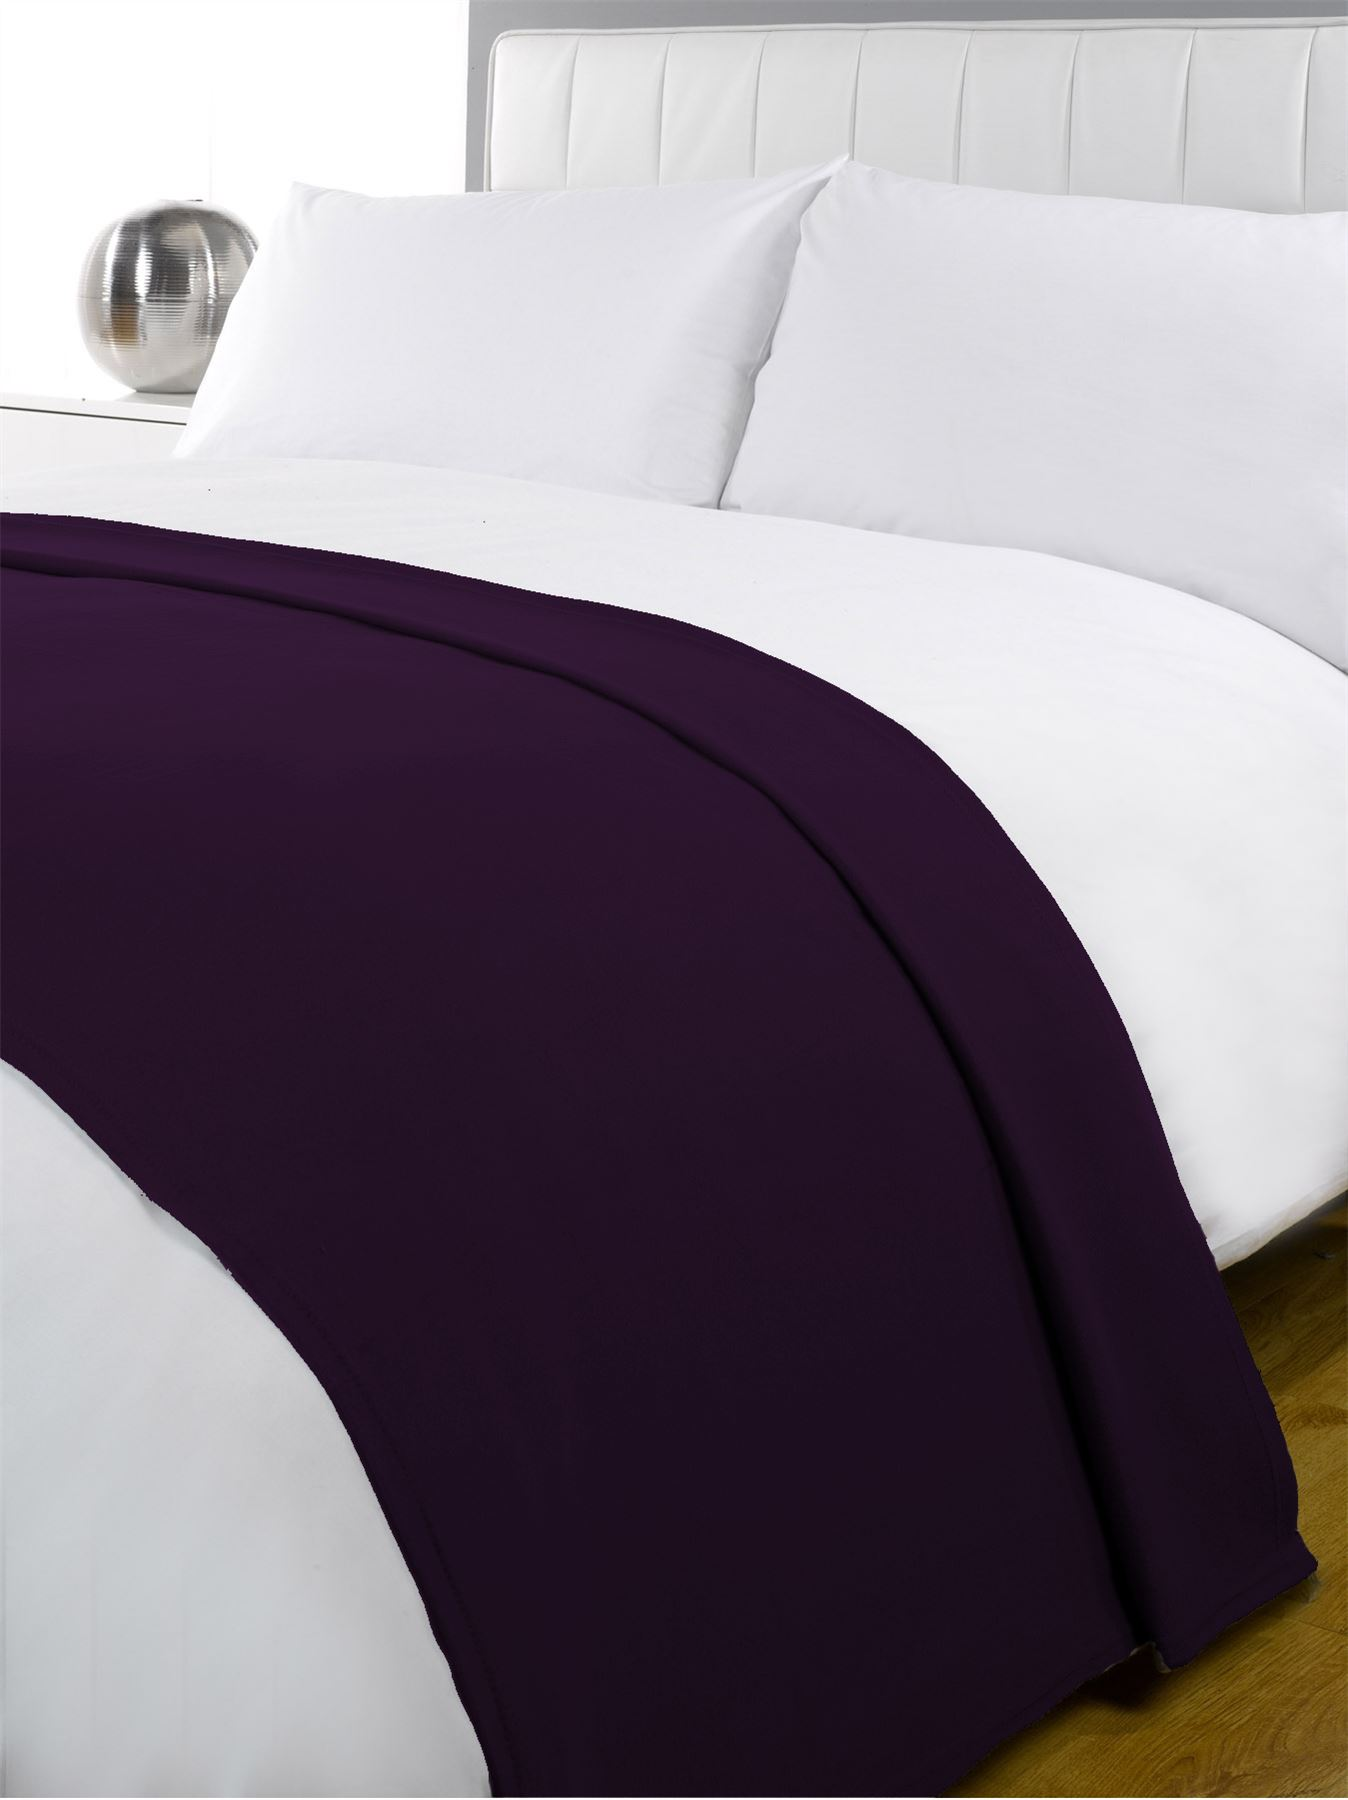 New Luxury Soft Fleece Blanket Warm Sofa Throw Single Double Bed Super Colours